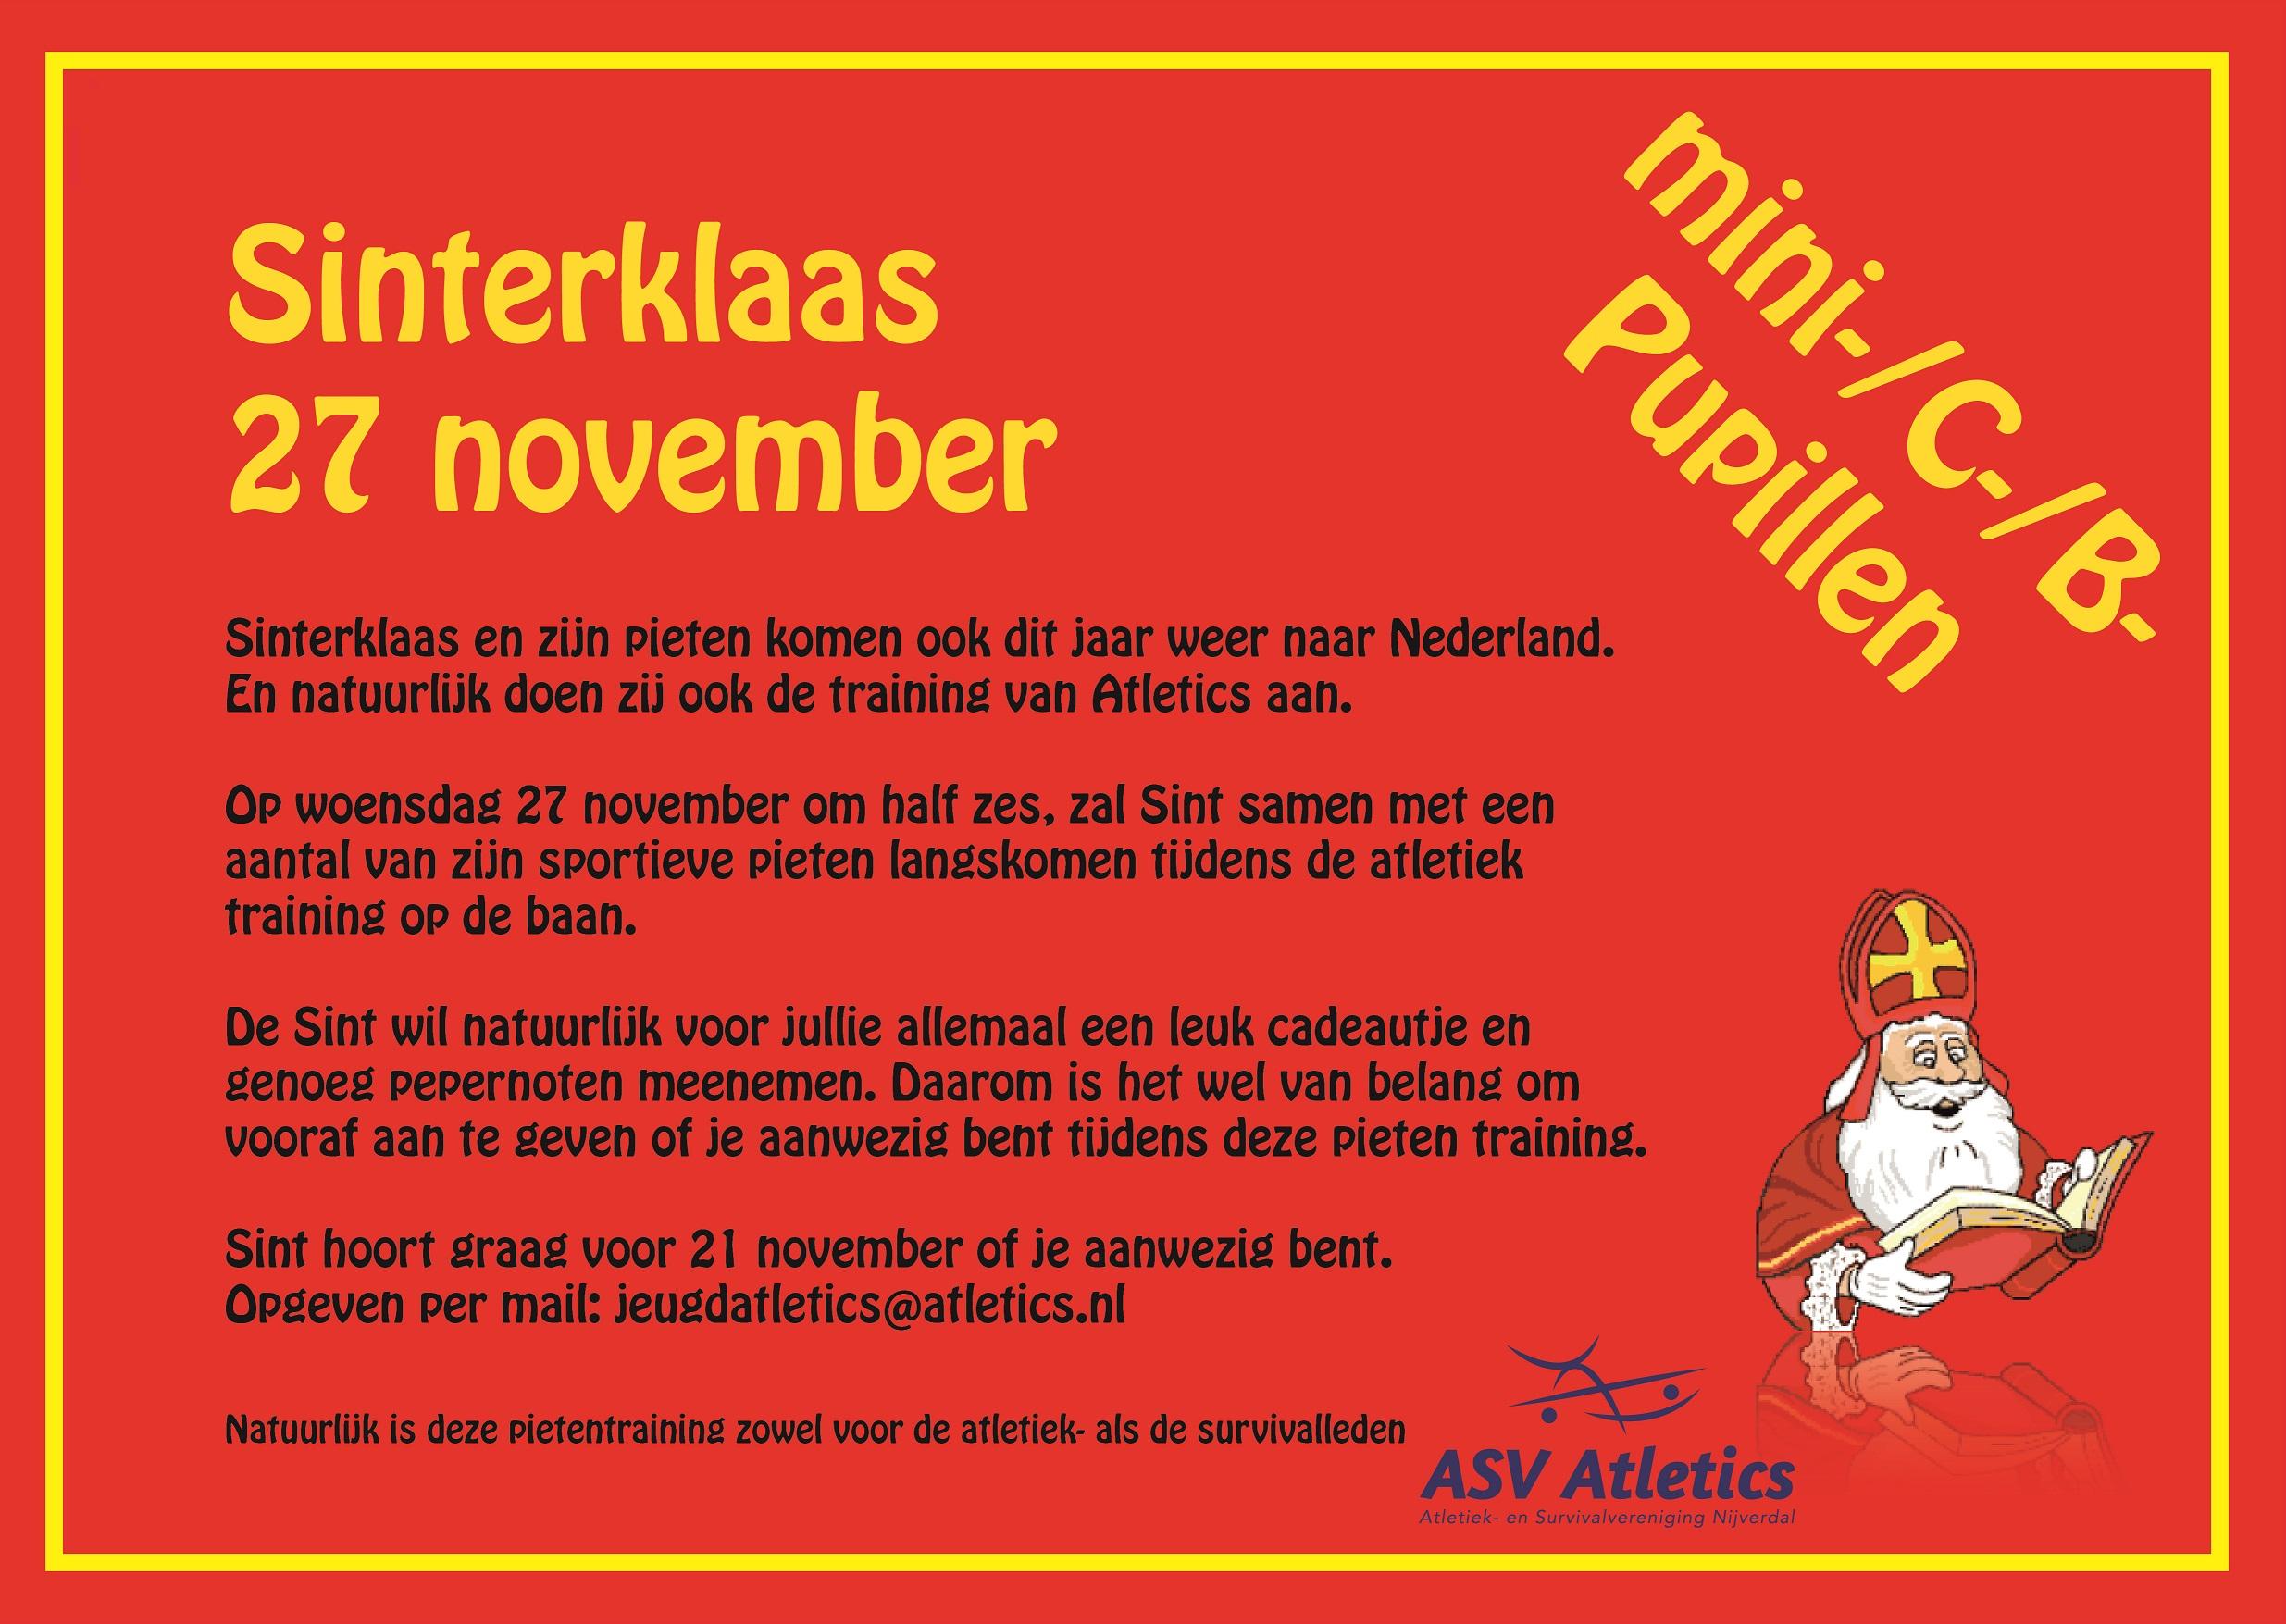 Sinterklaas 27 november